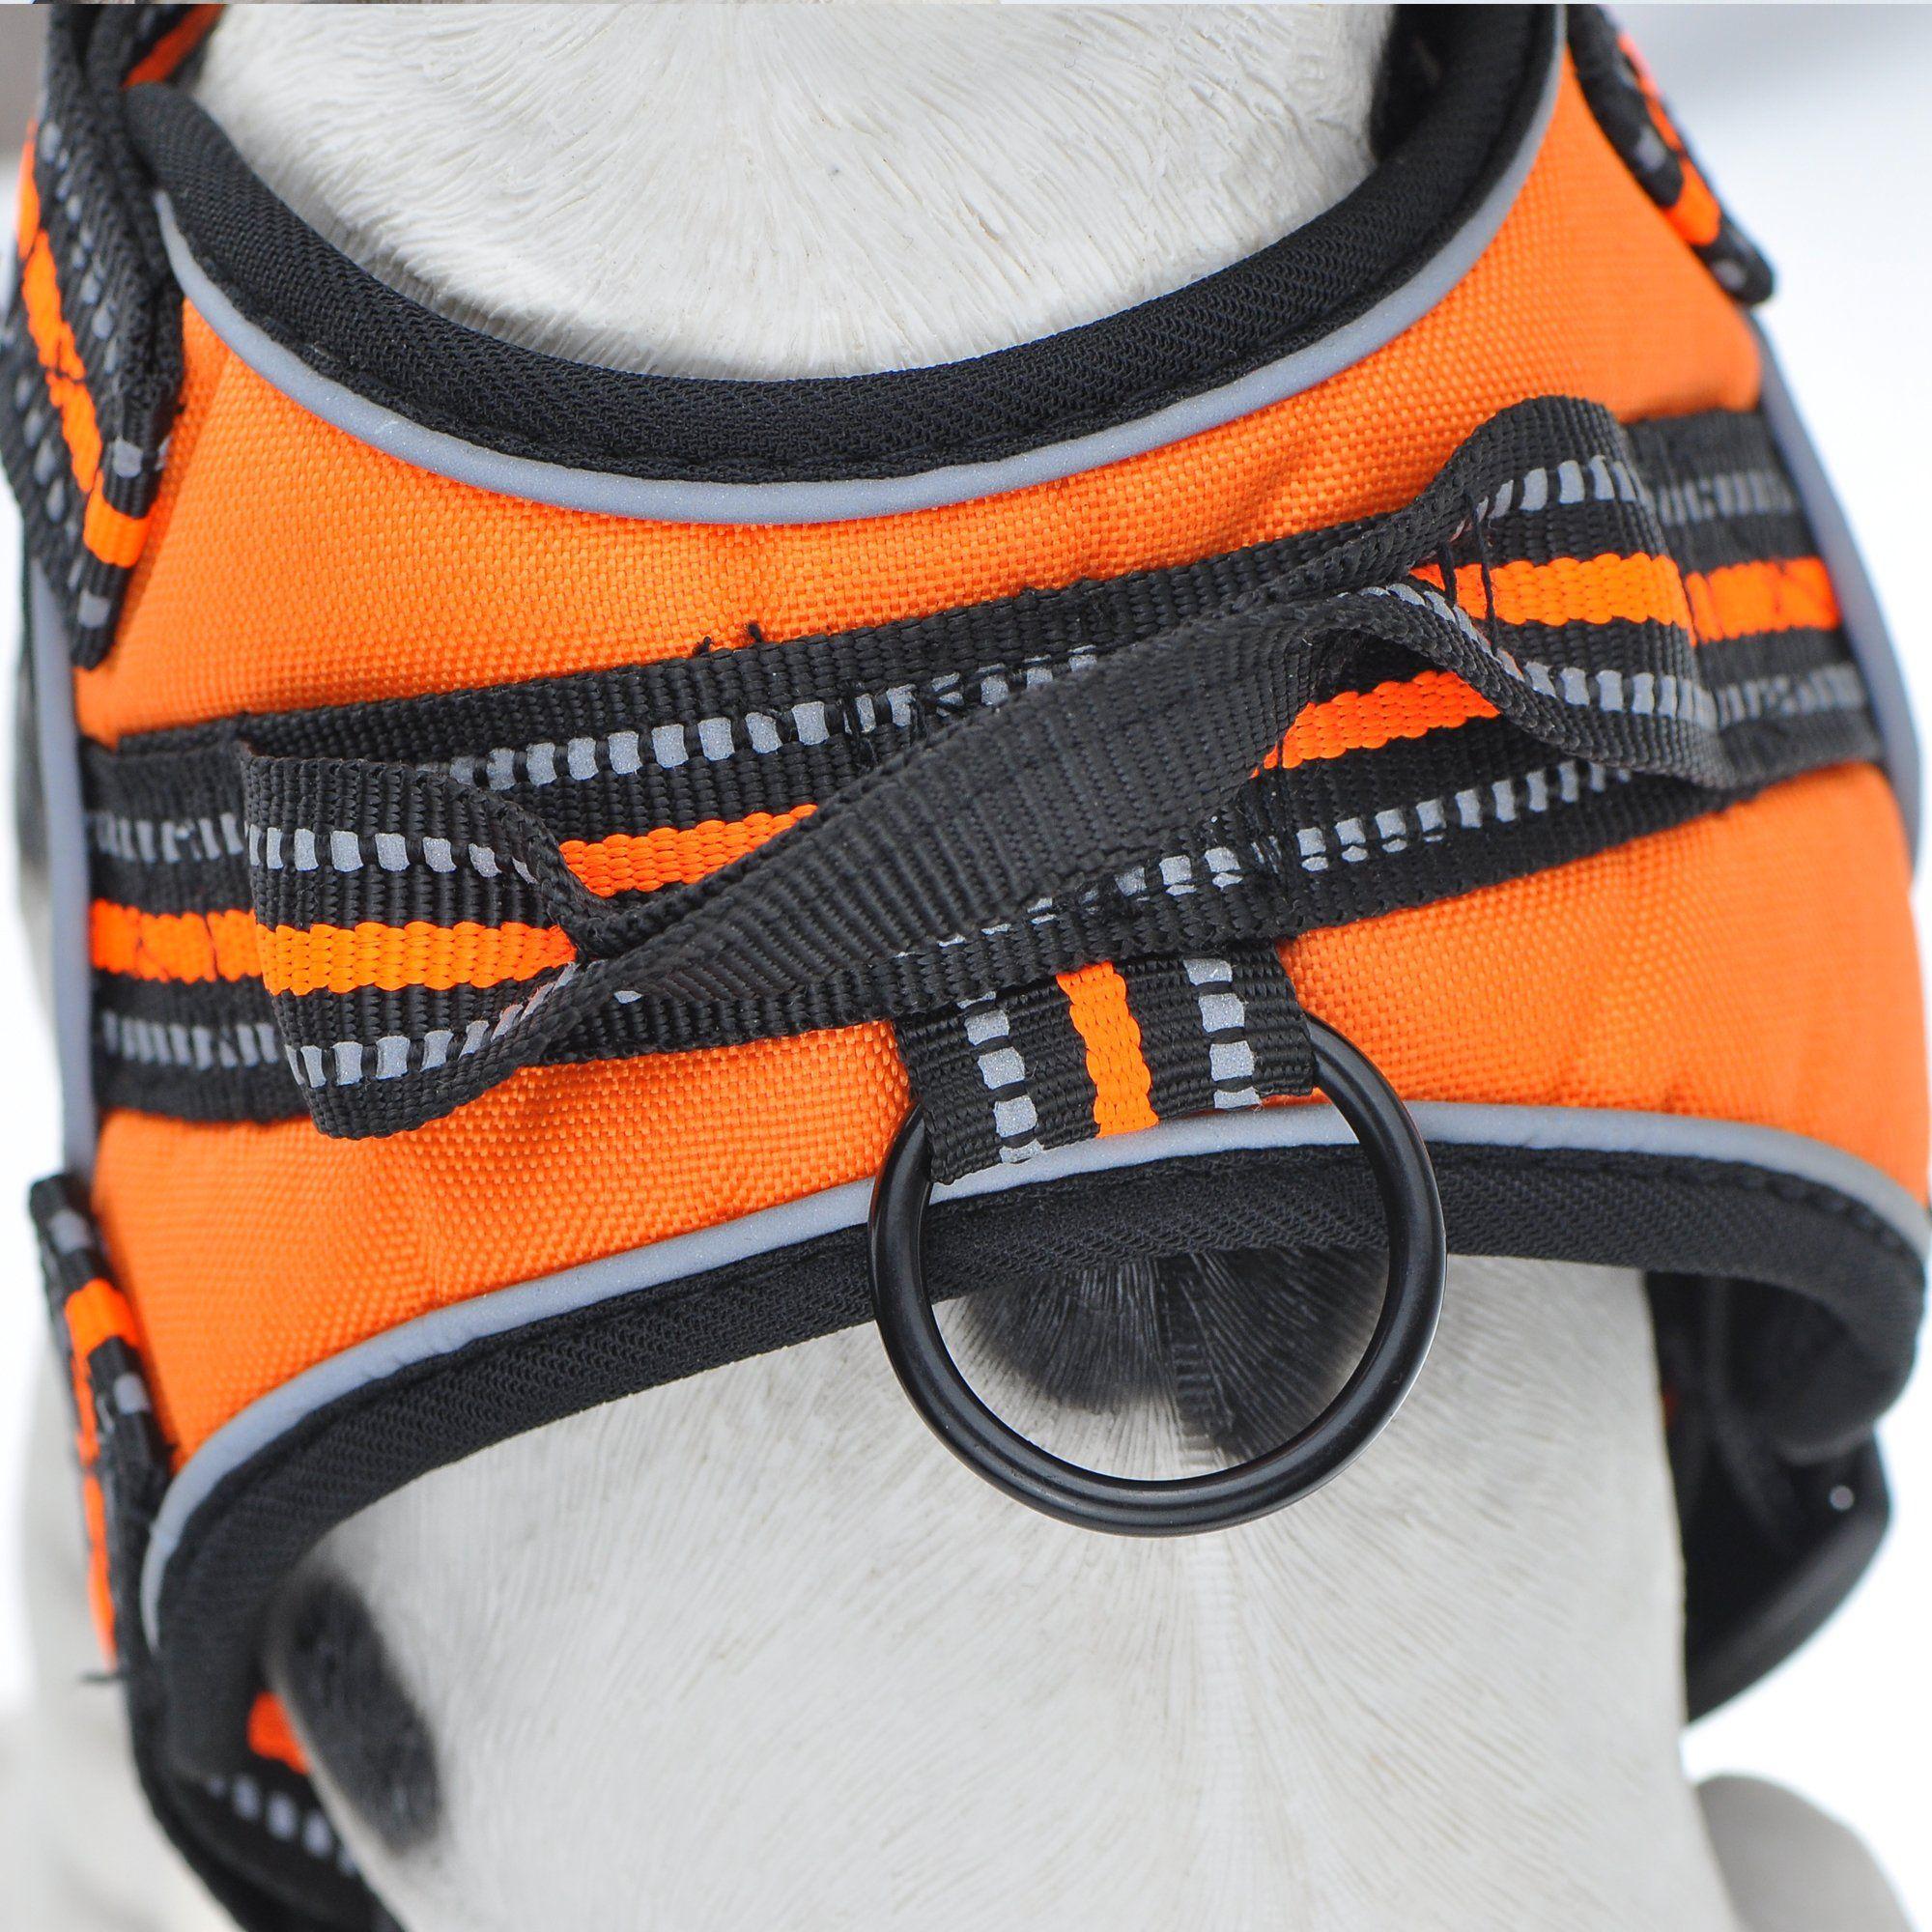 Dog Vest Soft Mesh Harness 3M Reflective Safety Band